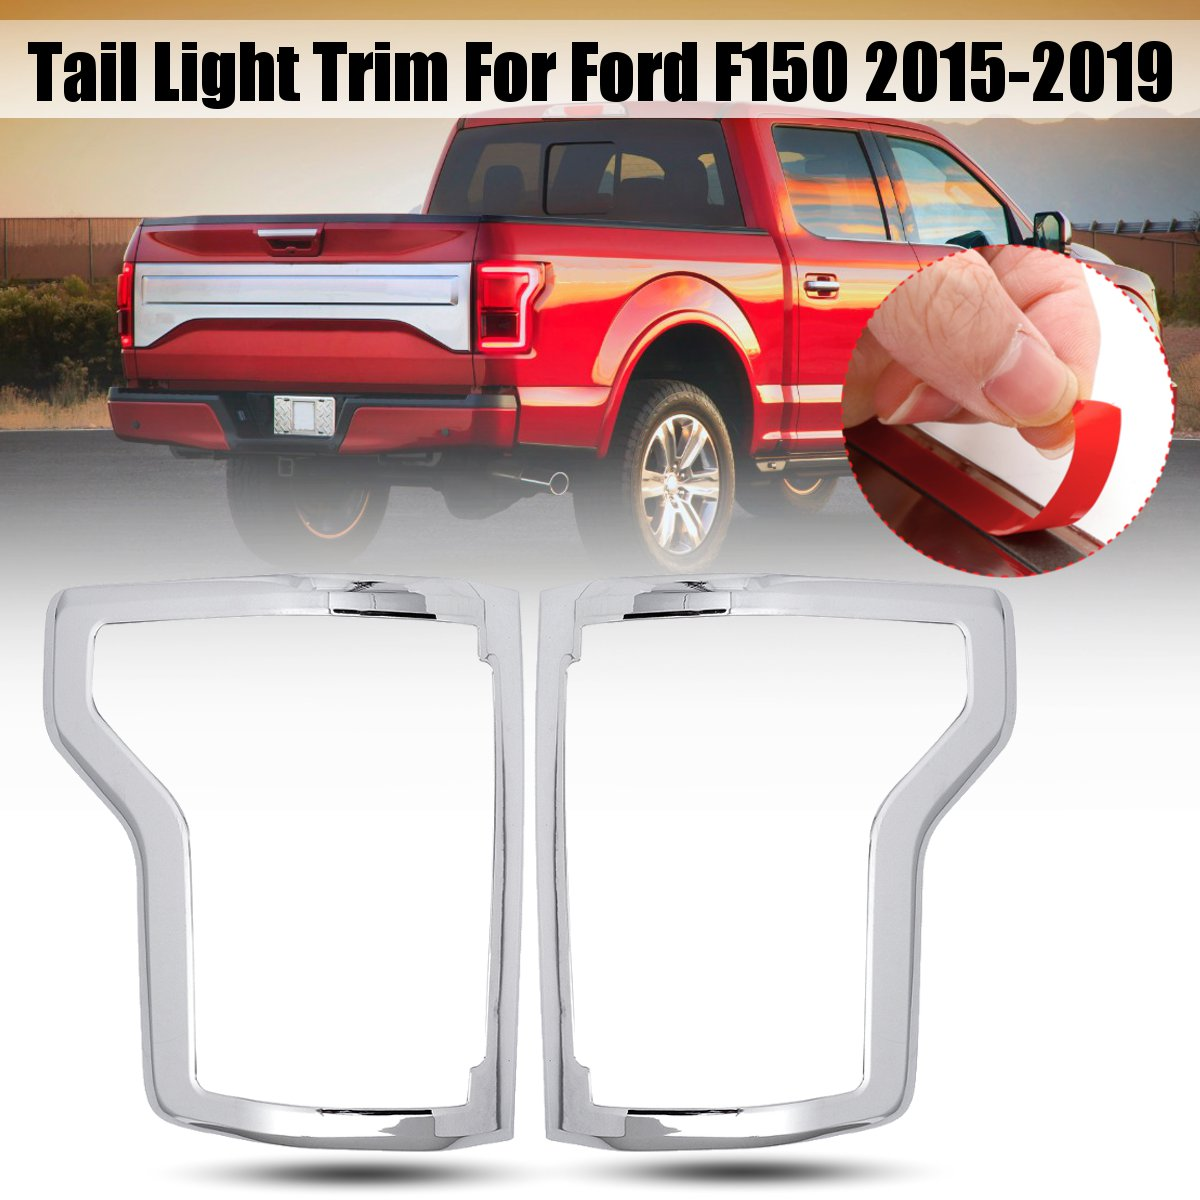 Pair ABS Chrome Rear Tail Light Lamp Frame Cover Trims For Ford F150 2015 2016 2017 2018 2019 Car Exterior AccessoriesPair ABS Chrome Rear Tail Light Lamp Frame Cover Trims For Ford F150 2015 2016 2017 2018 2019 Car Exterior Accessories